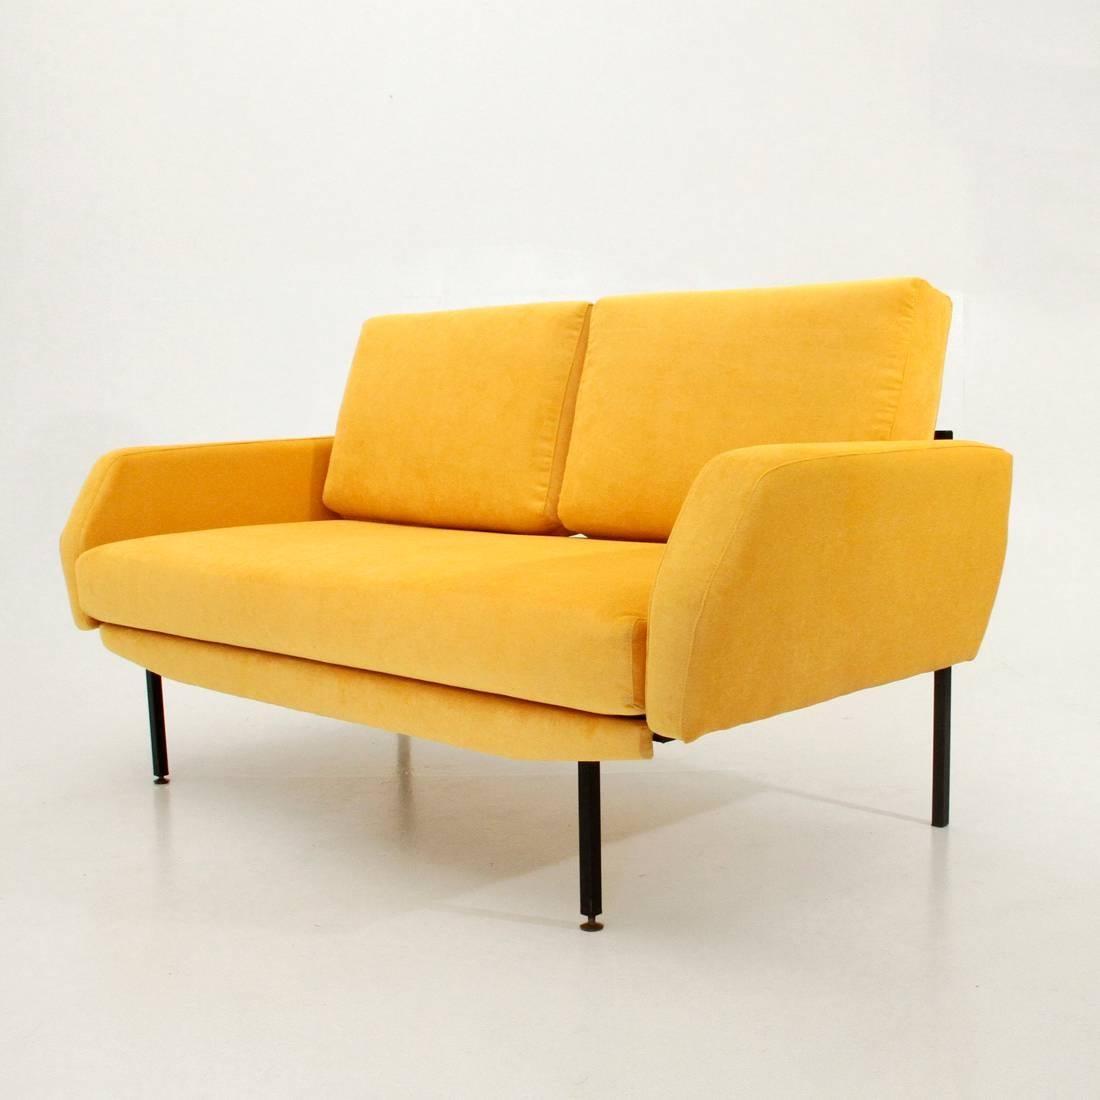 Italian Yellow Velvet Sofa Bed In Excellent Condition For Sale In Savona, IT